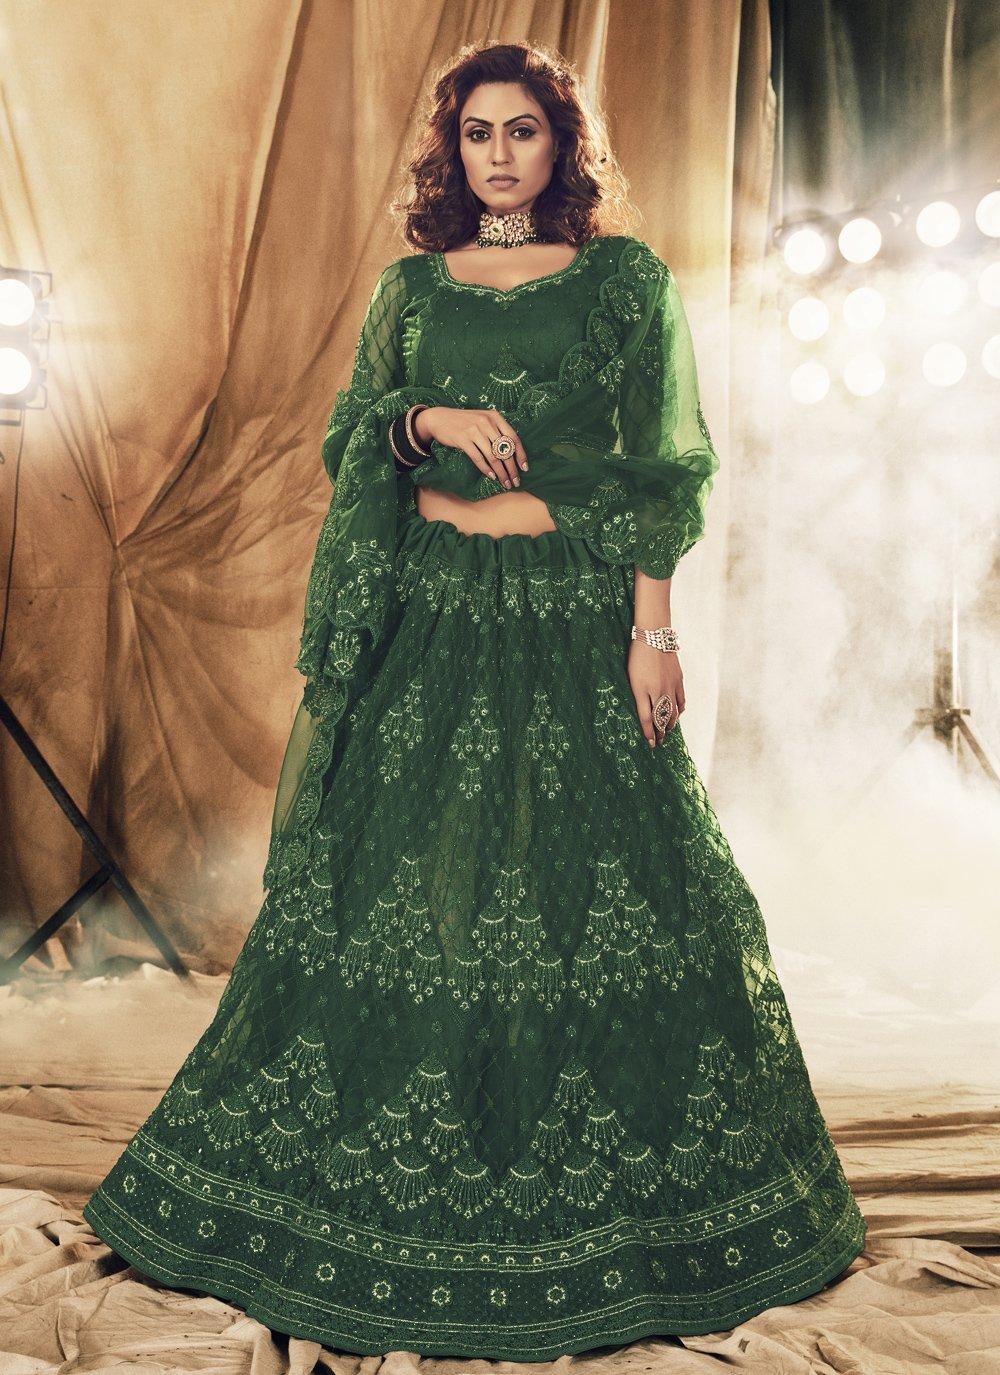 Green Engagement Net Lehenga Choli